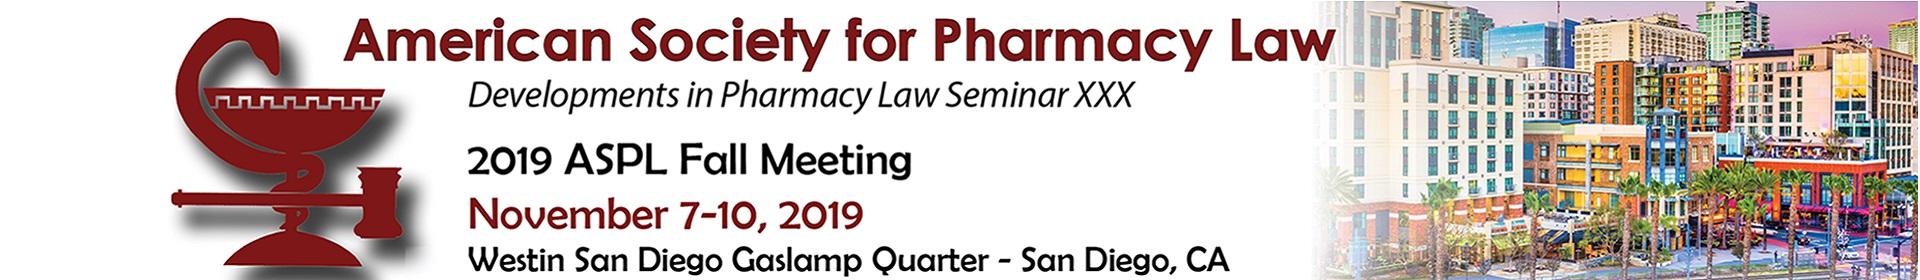 ASPL Developments in Pharmacy Law Seminar XXX Event Banner